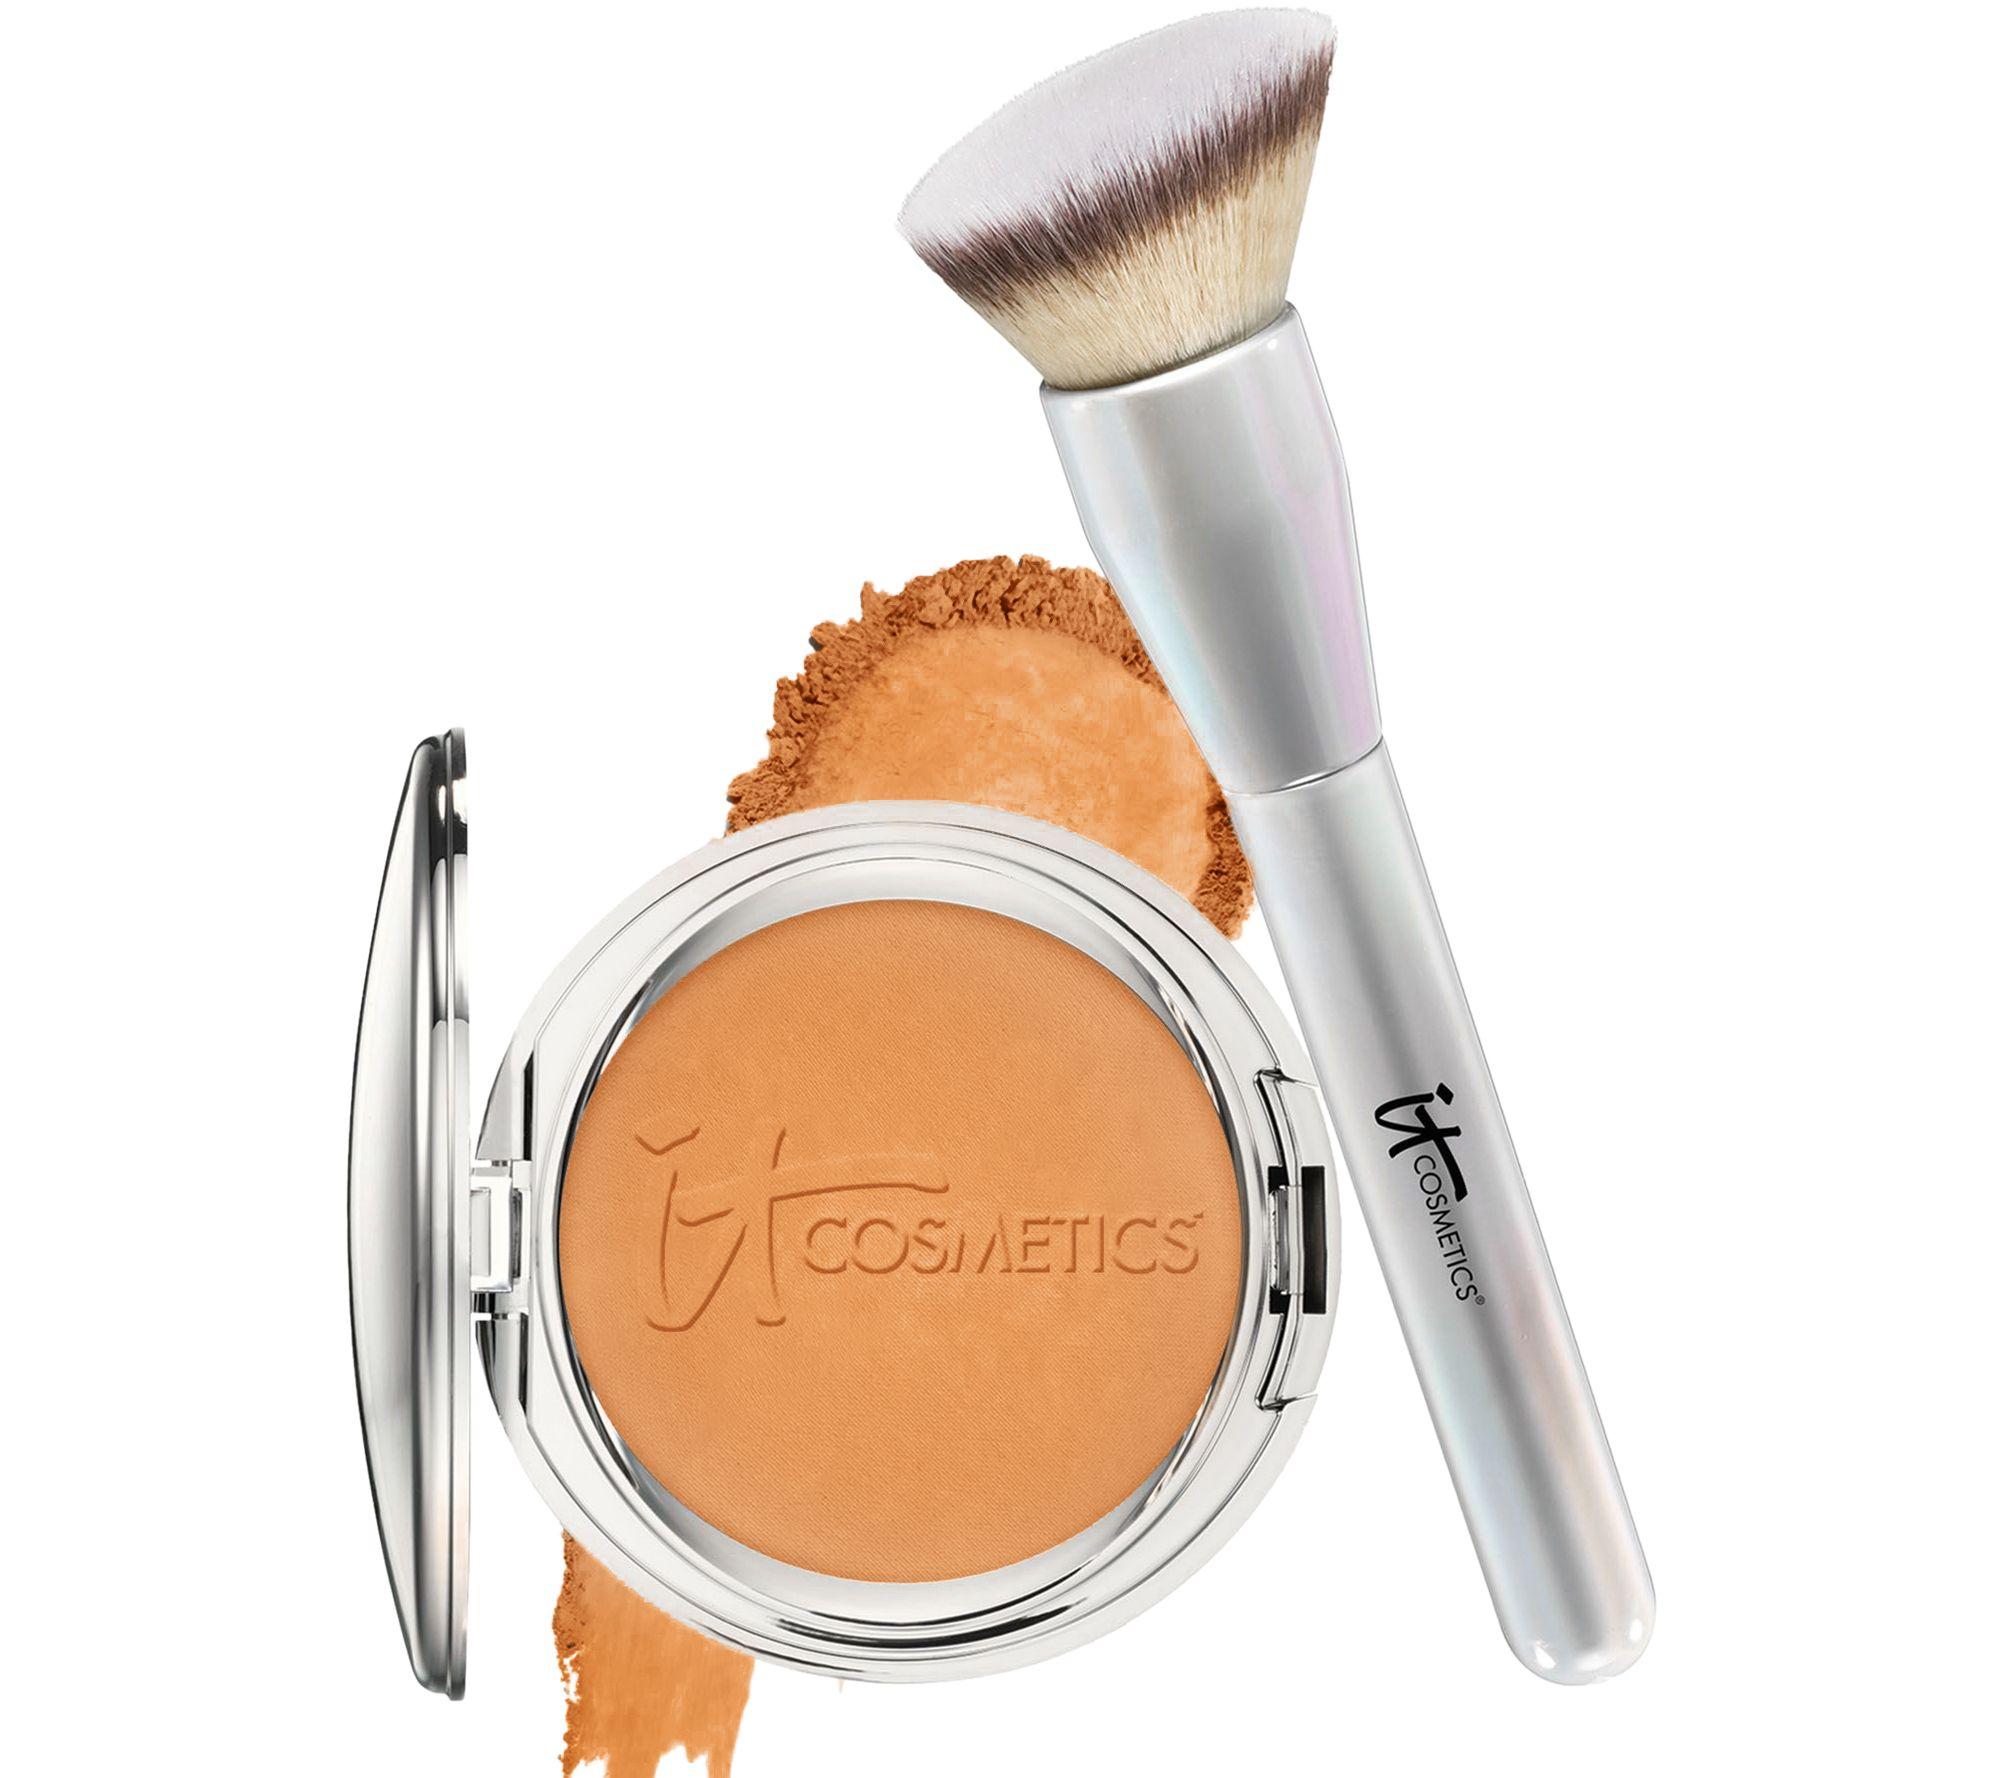 It Cosmetics x ULTA Love Beauty Fully All Over Powder Brush #211 by IT Cosmetics #12